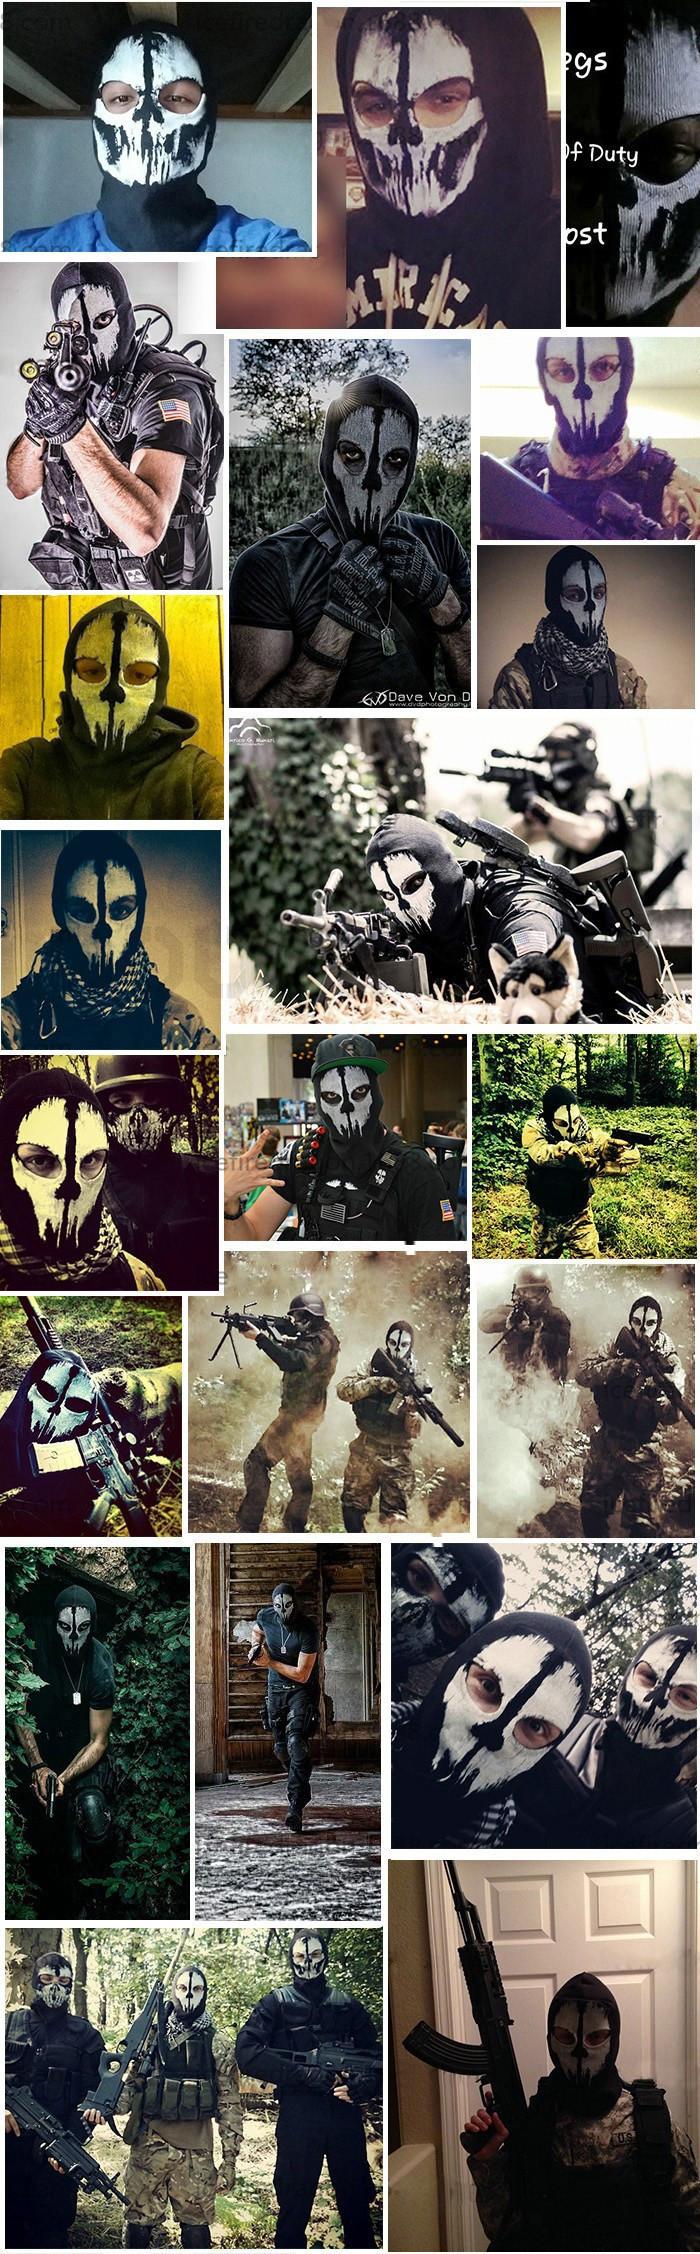 Coon Black Ghost Mask Skull Bike Cycling Motorcycle Ski Fishing Balaclava